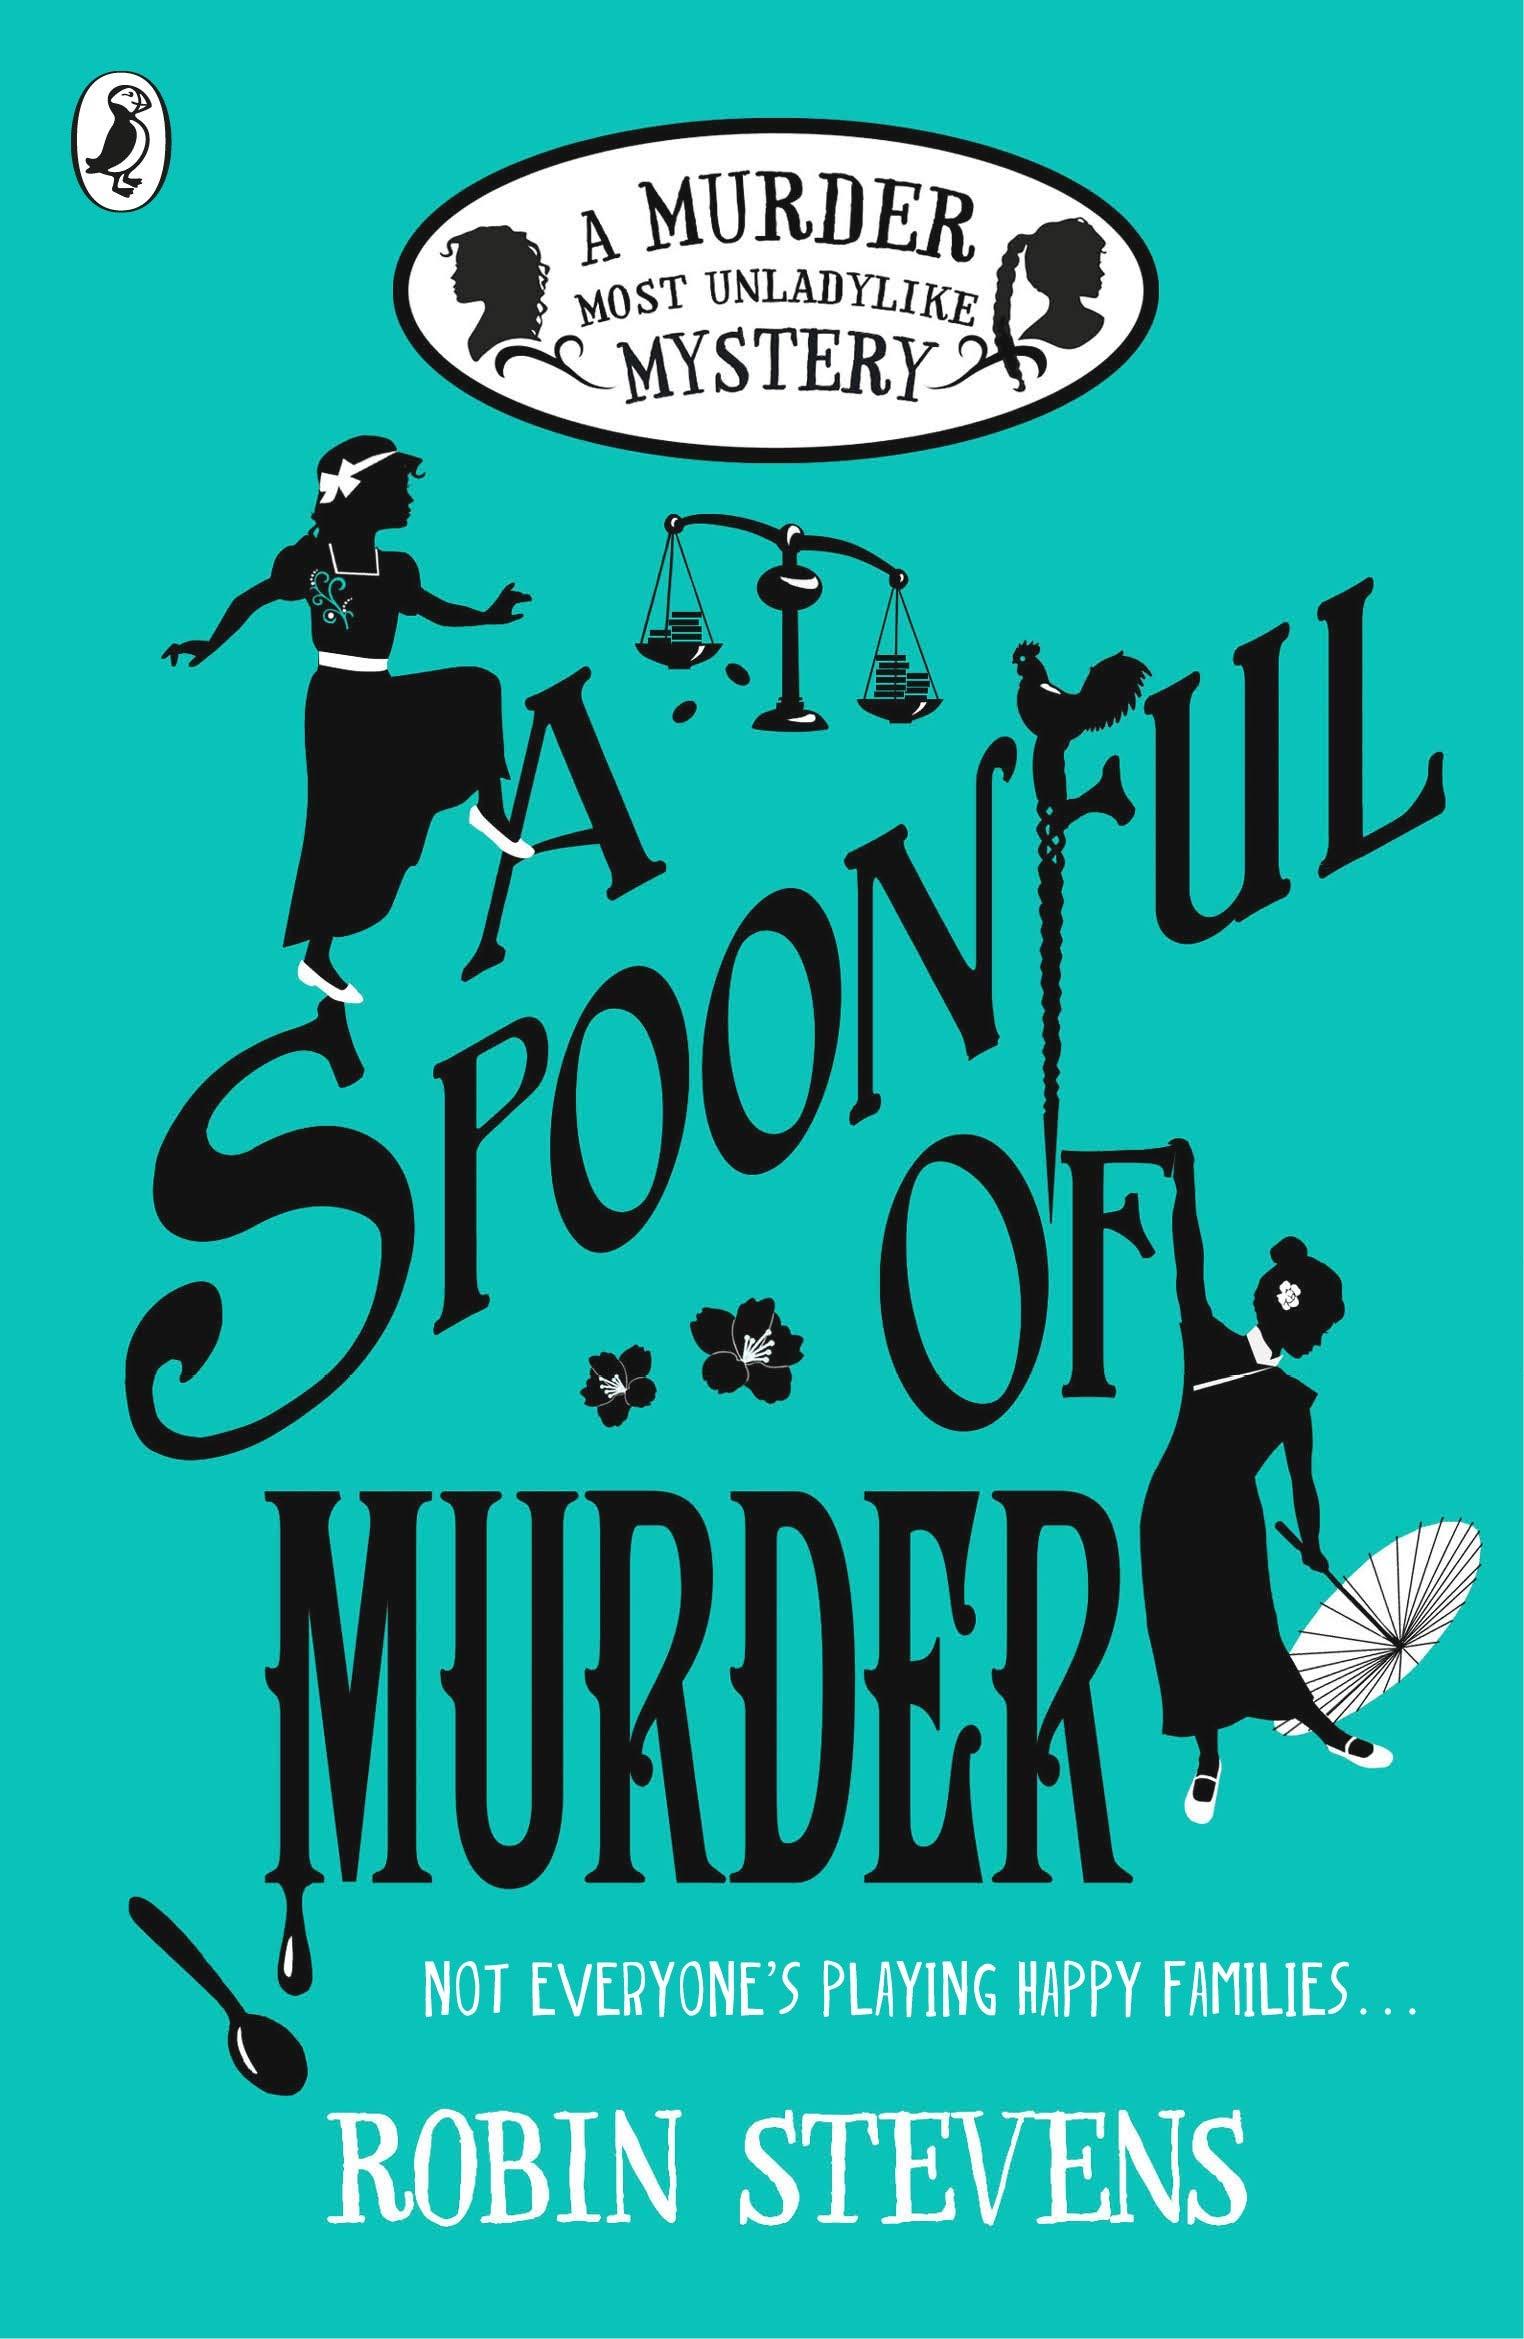 Spoonful of Murder | Robin Stevens | Charlie Byrne's